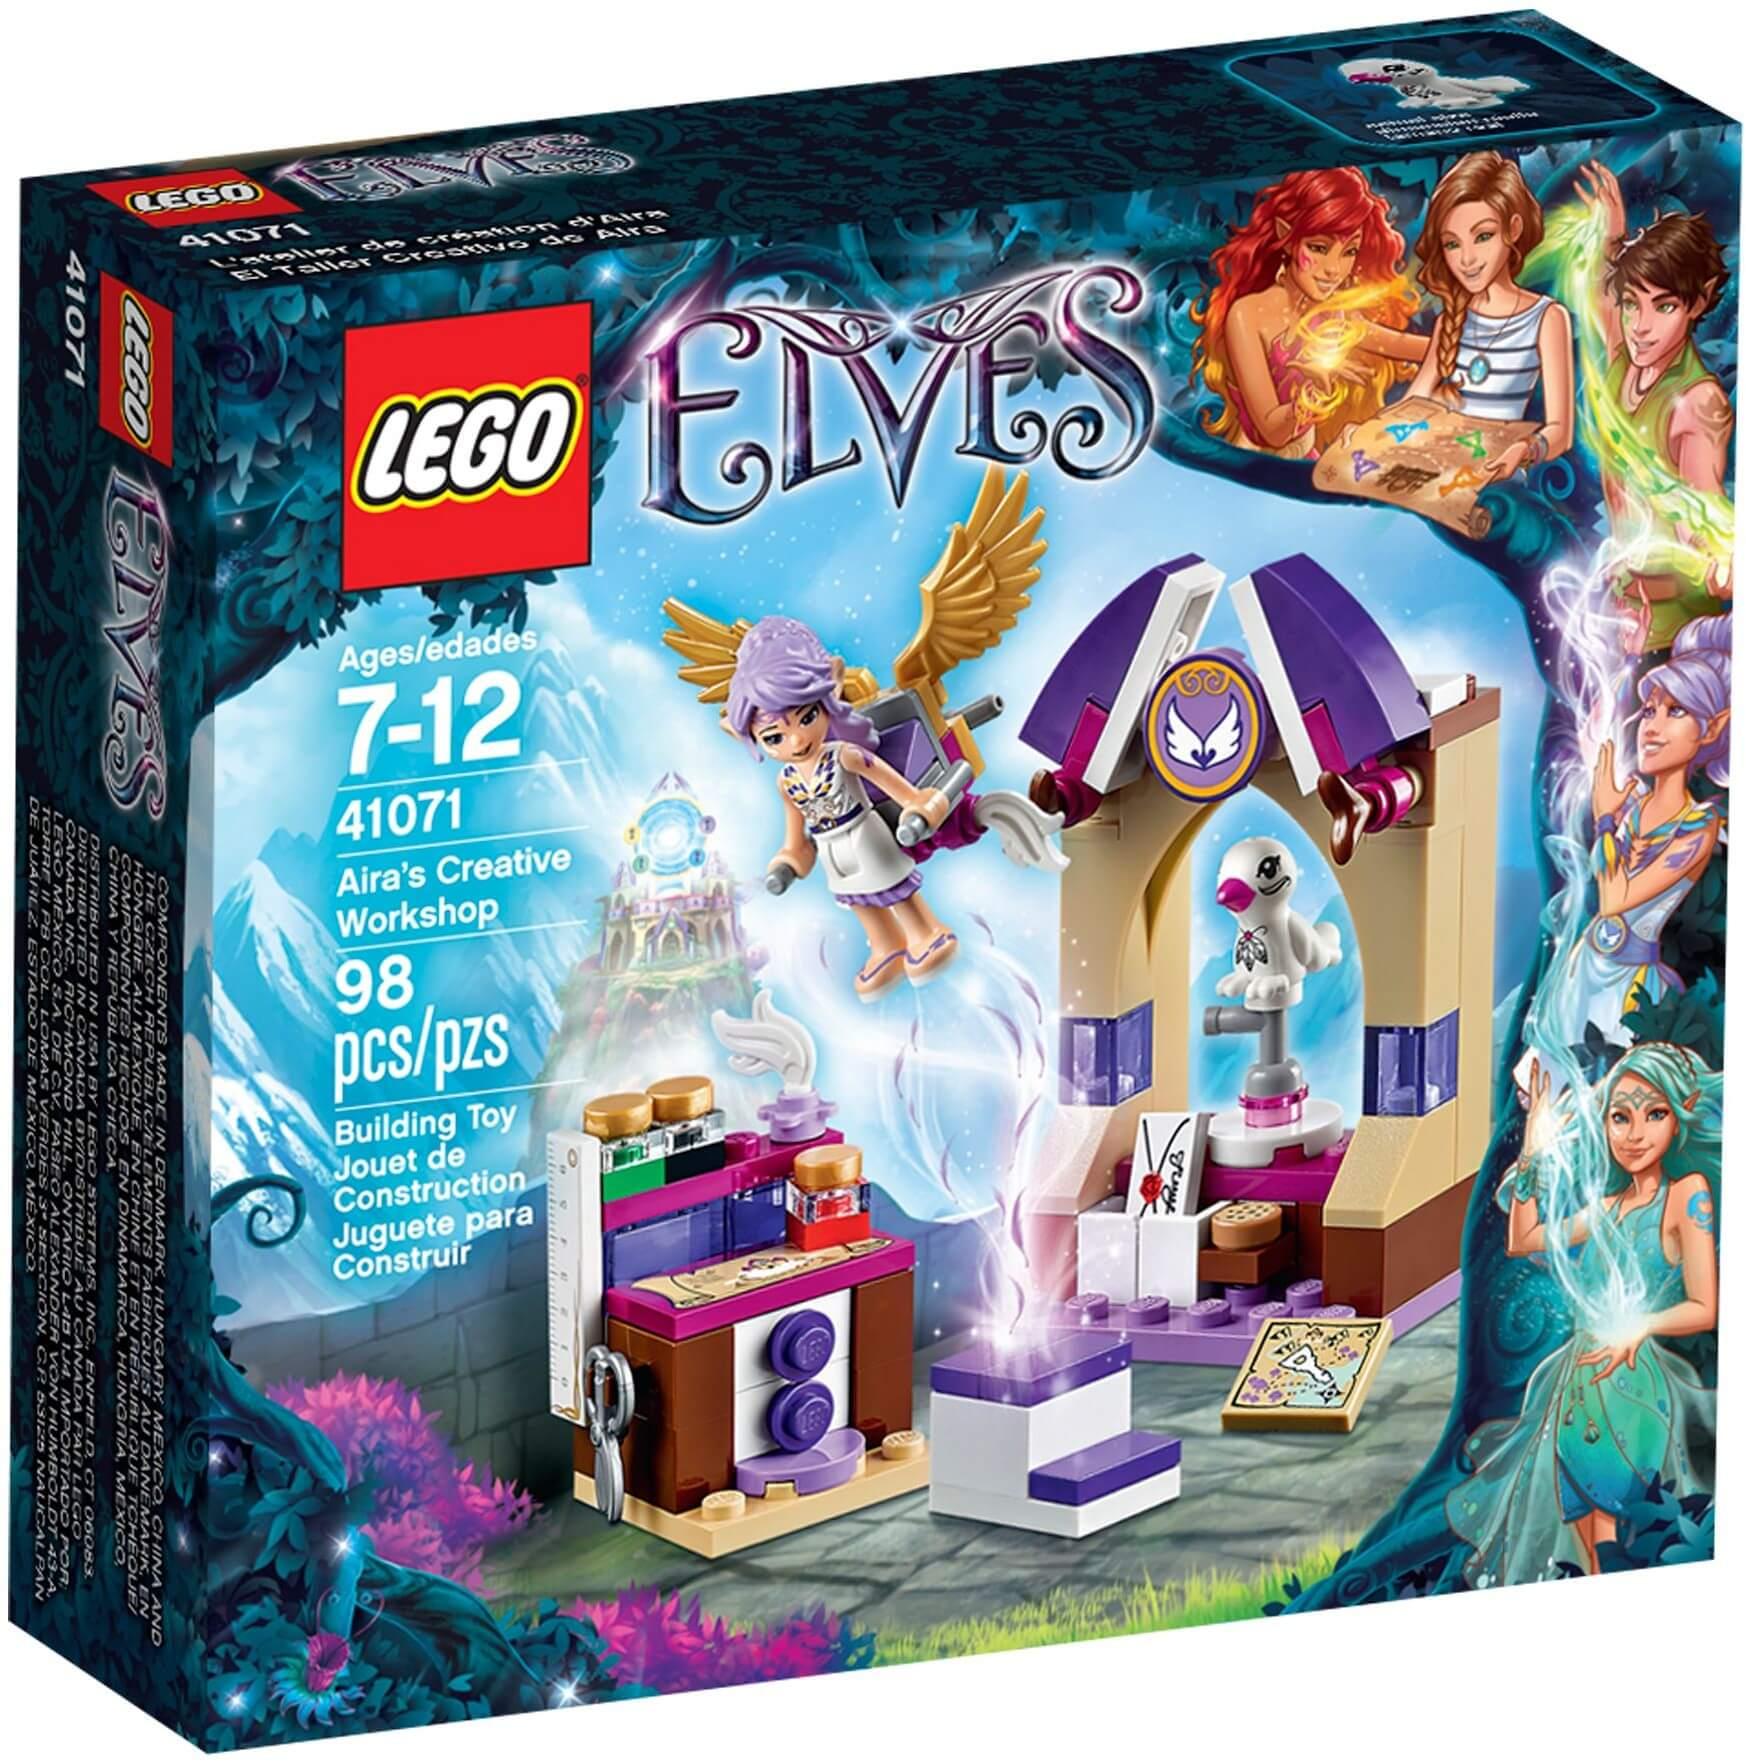 Mua đồ chơi LEGO 41071 - LEGO Elves 41071 - Xưởng Chế Tạo Ma Thuật Của Aira (LEGO Elves Aira's Creative Workshop 41071)